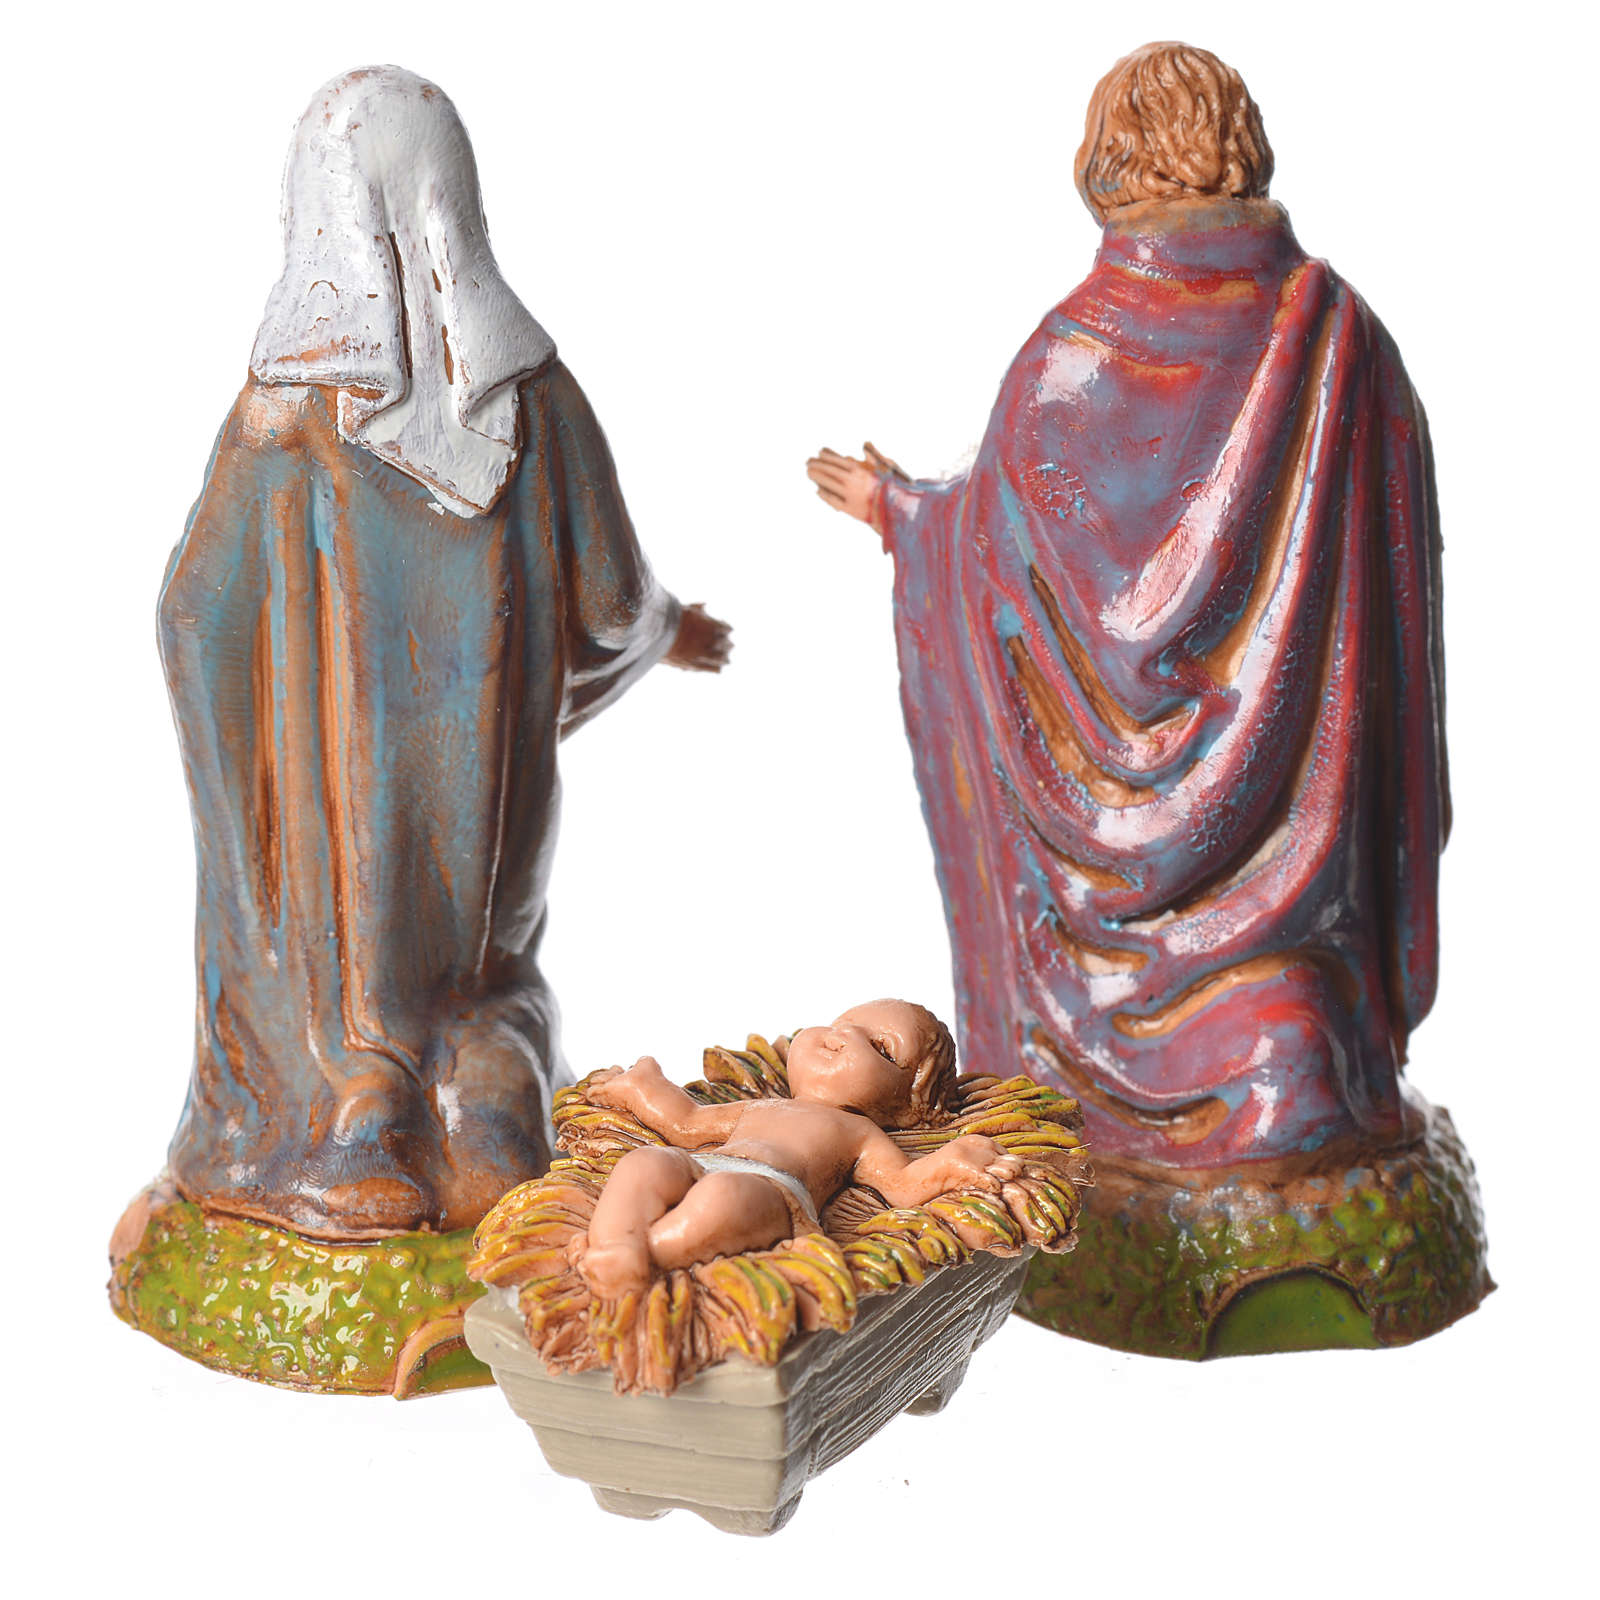 Nativity Scene figurines by Moranduzzo 6cm, 3 pieces 4